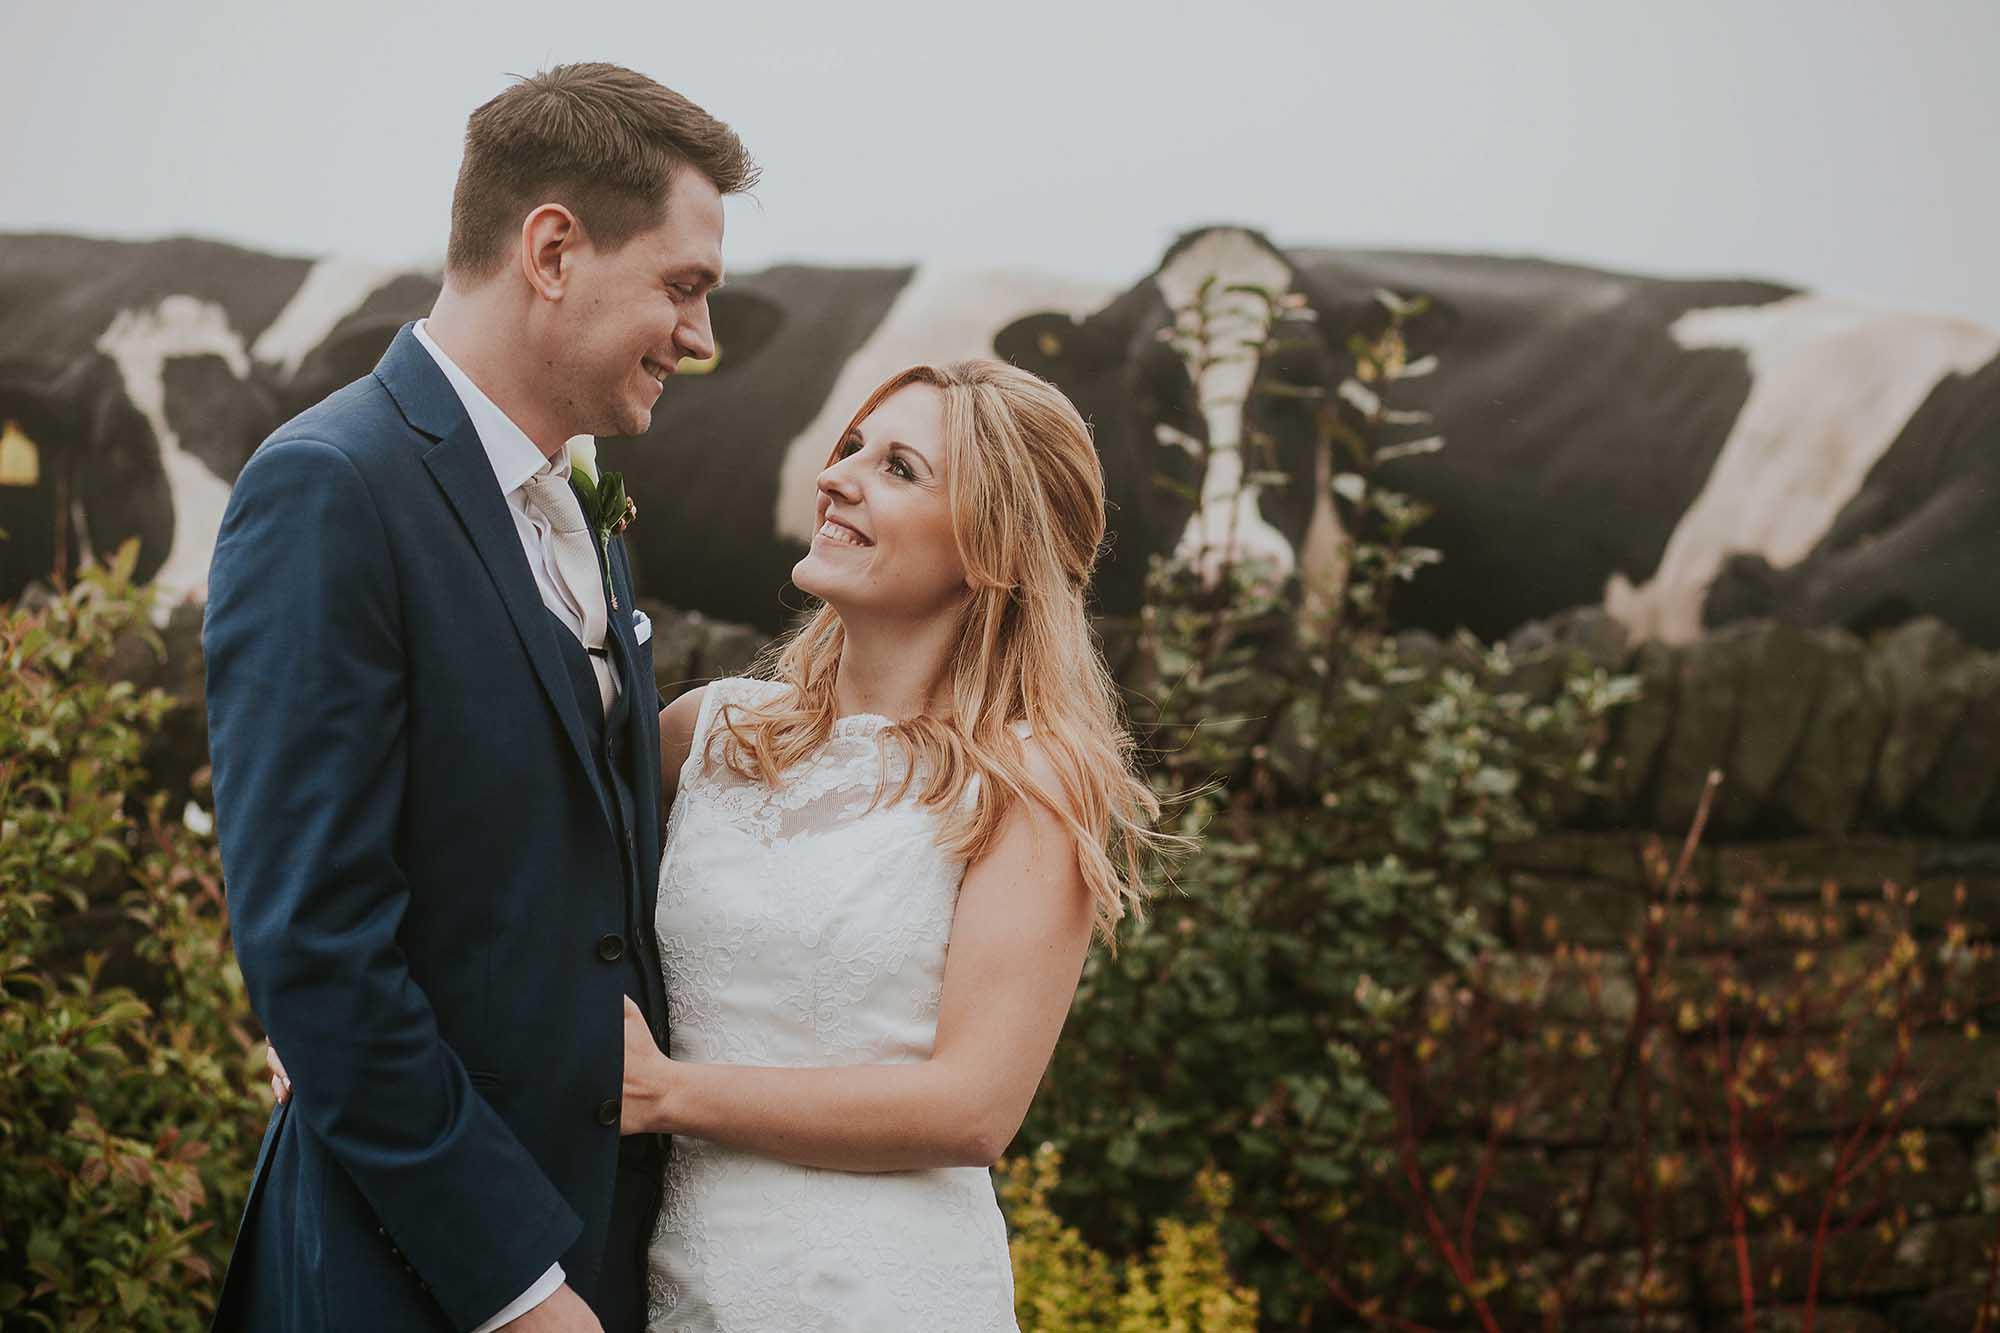 The White Hart Inn wedding photography